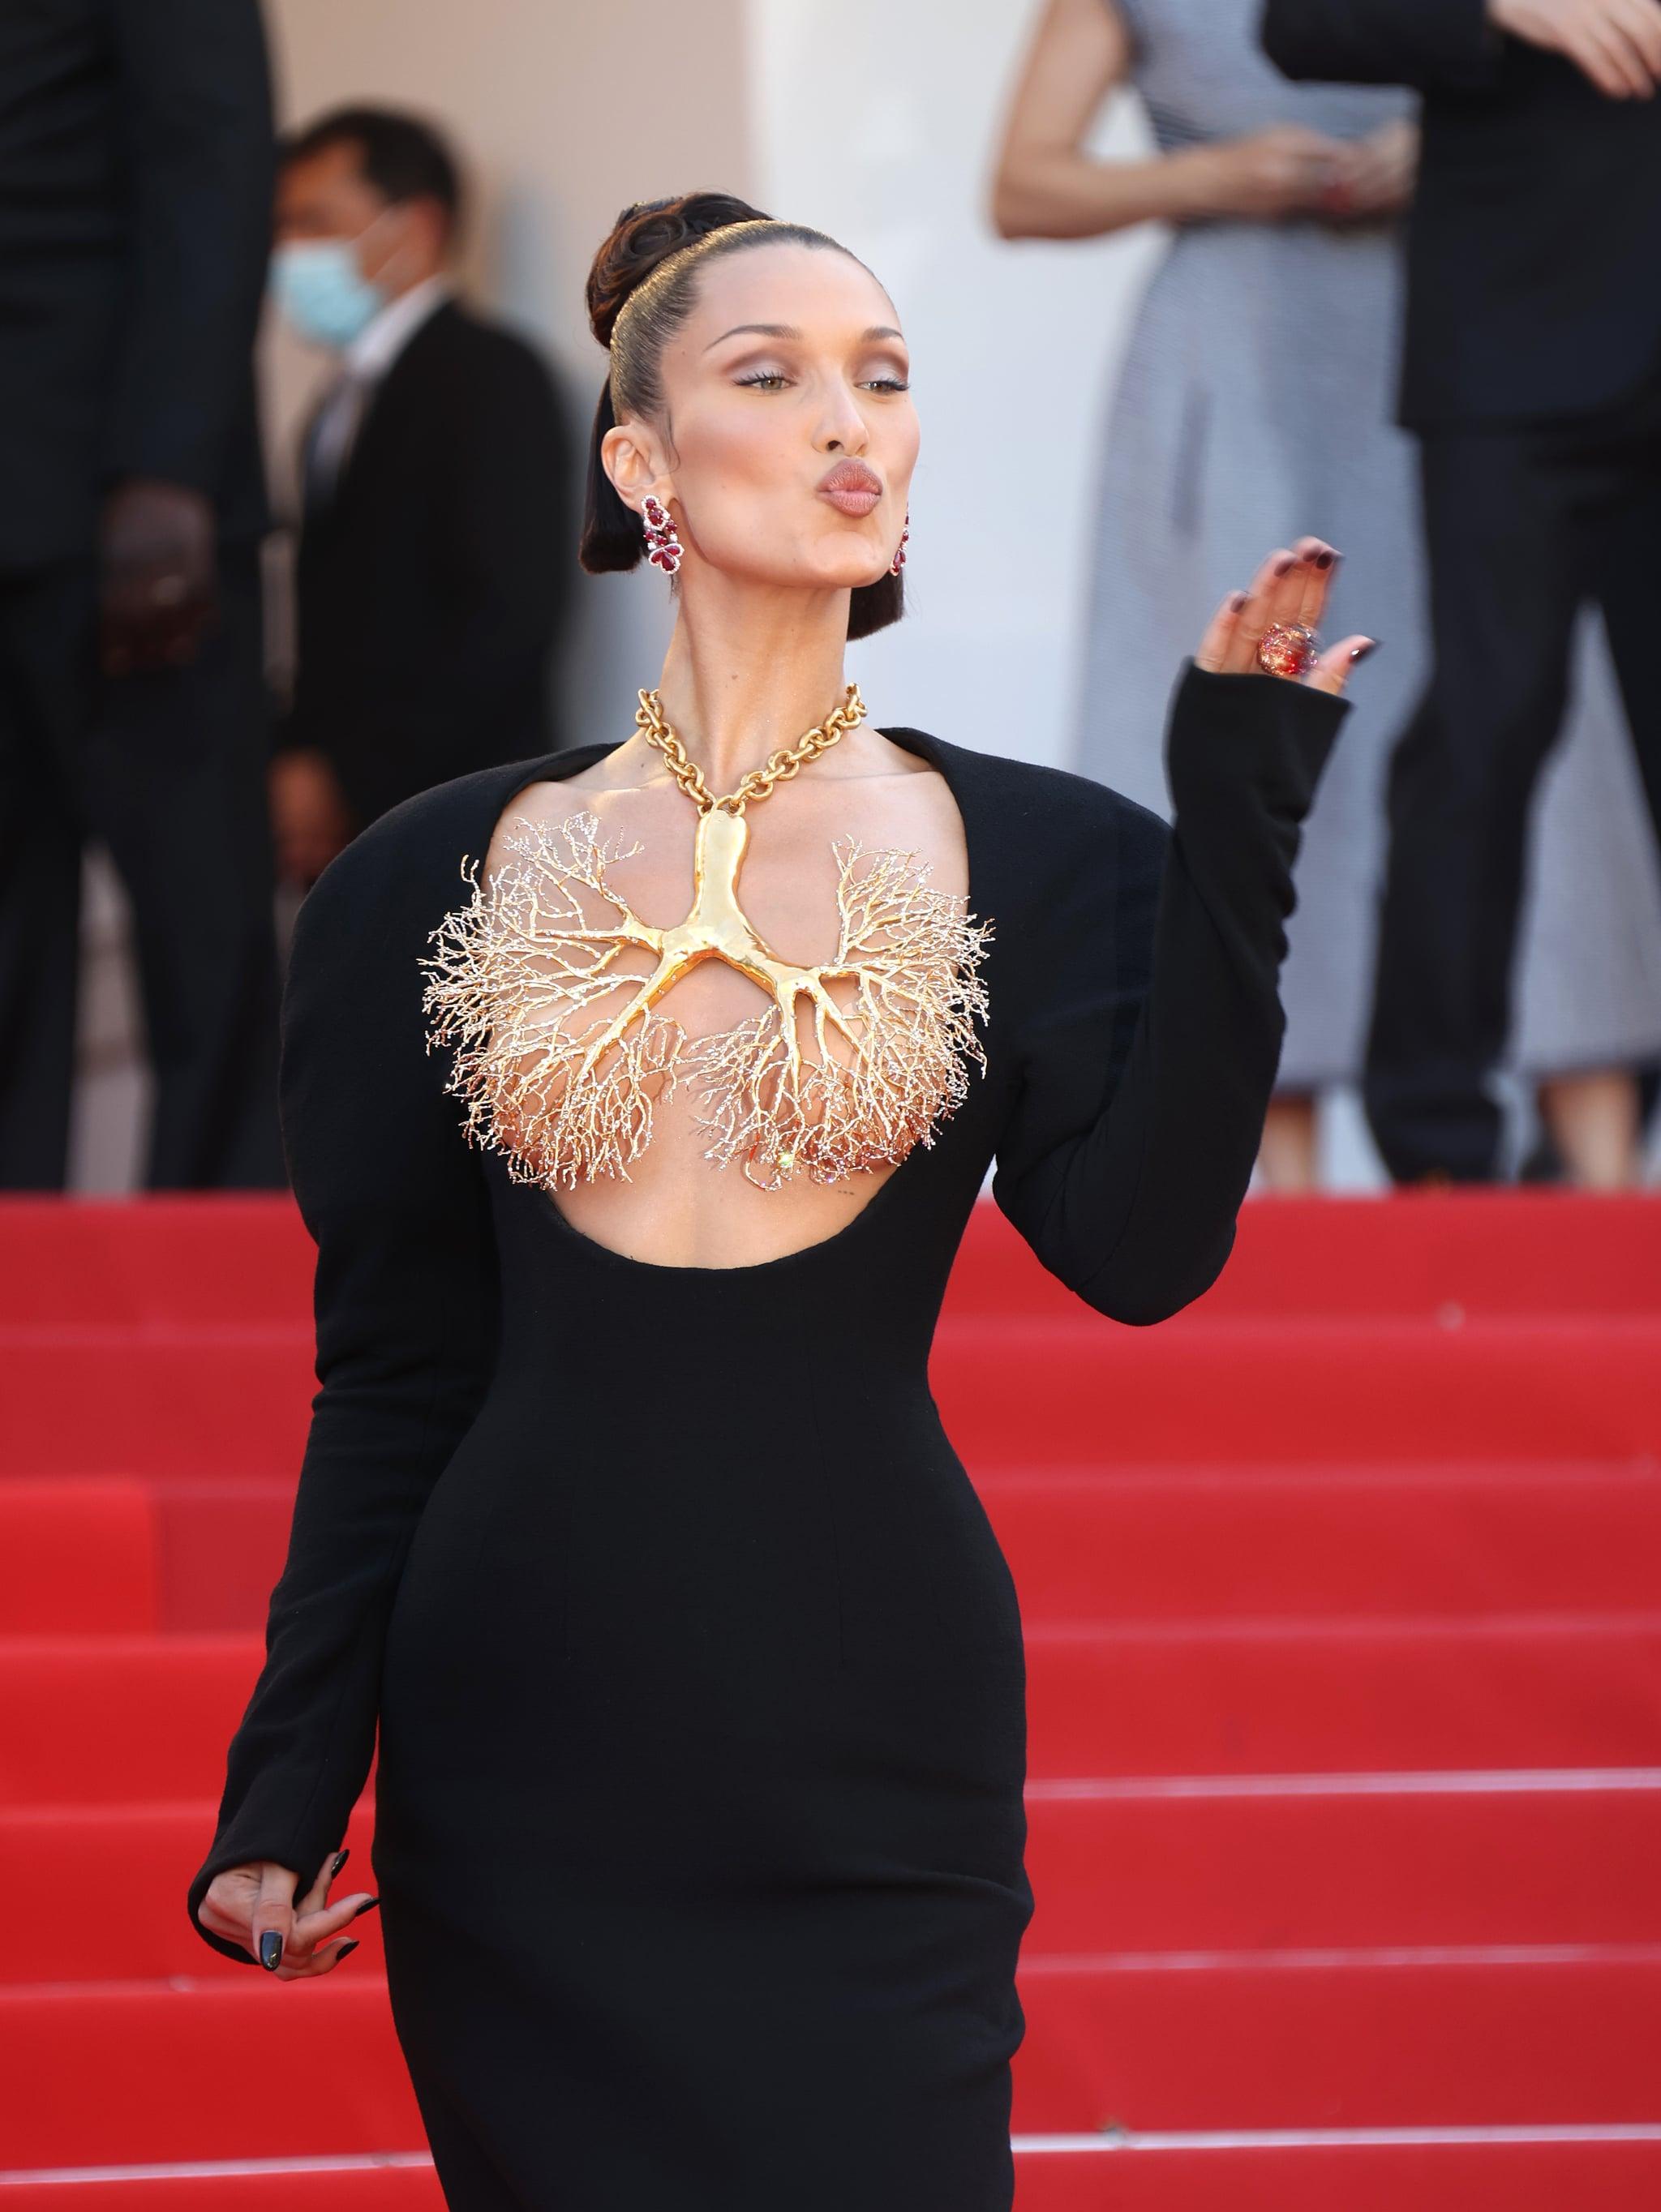 Bella Hadid Wears Sexy Schiaparelli Outfit at Cannes | POPSUGAR Fashion